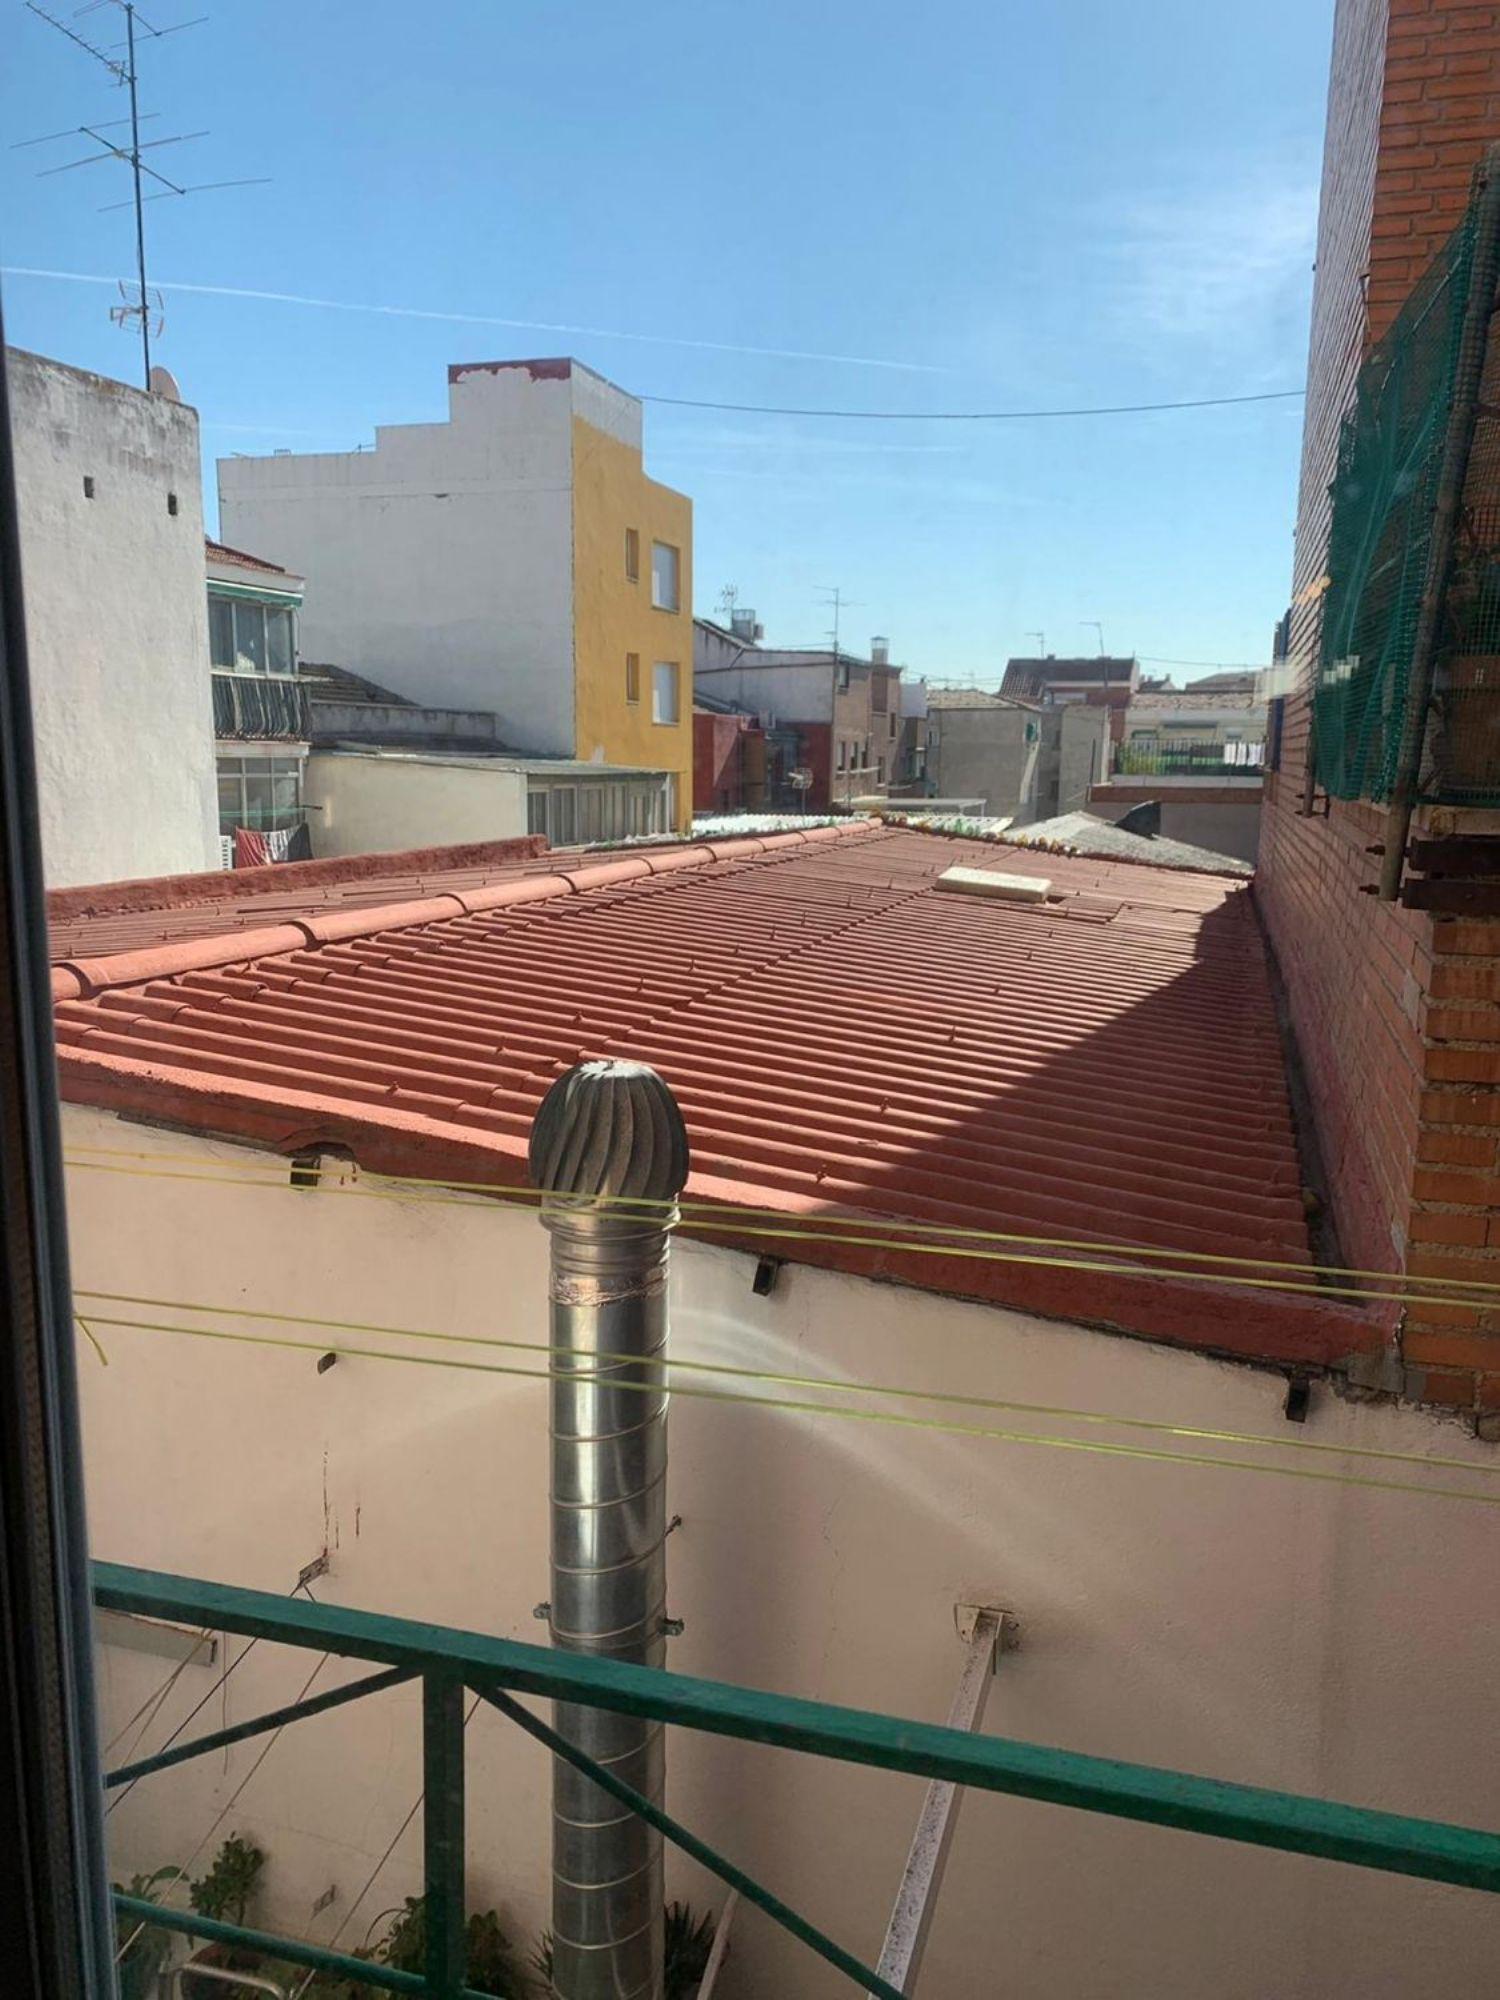 Piso en venta en Madrid capital, Madrid 13 thumbnail